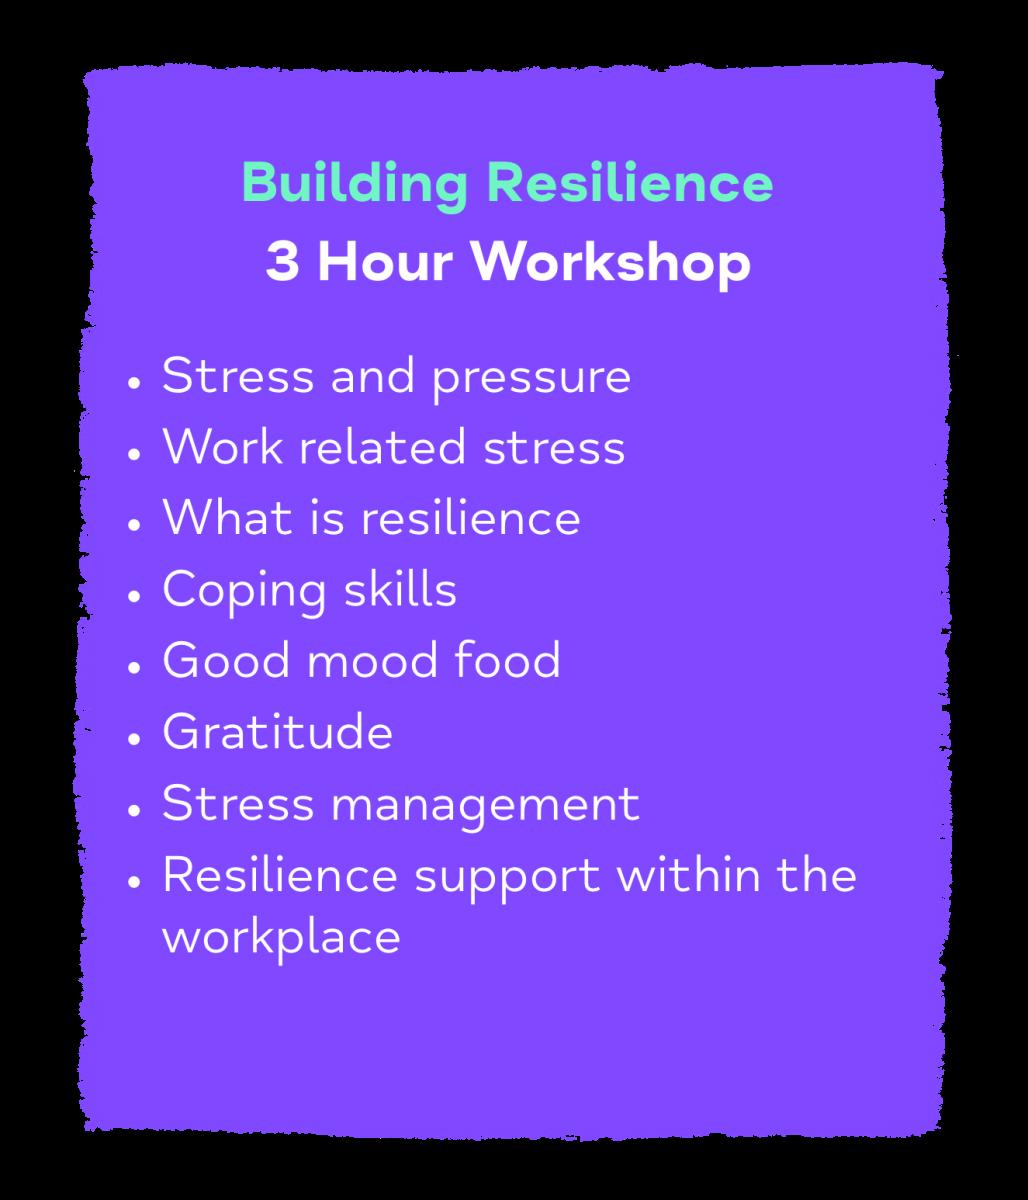 Building Resilience 3 Hour Workshop